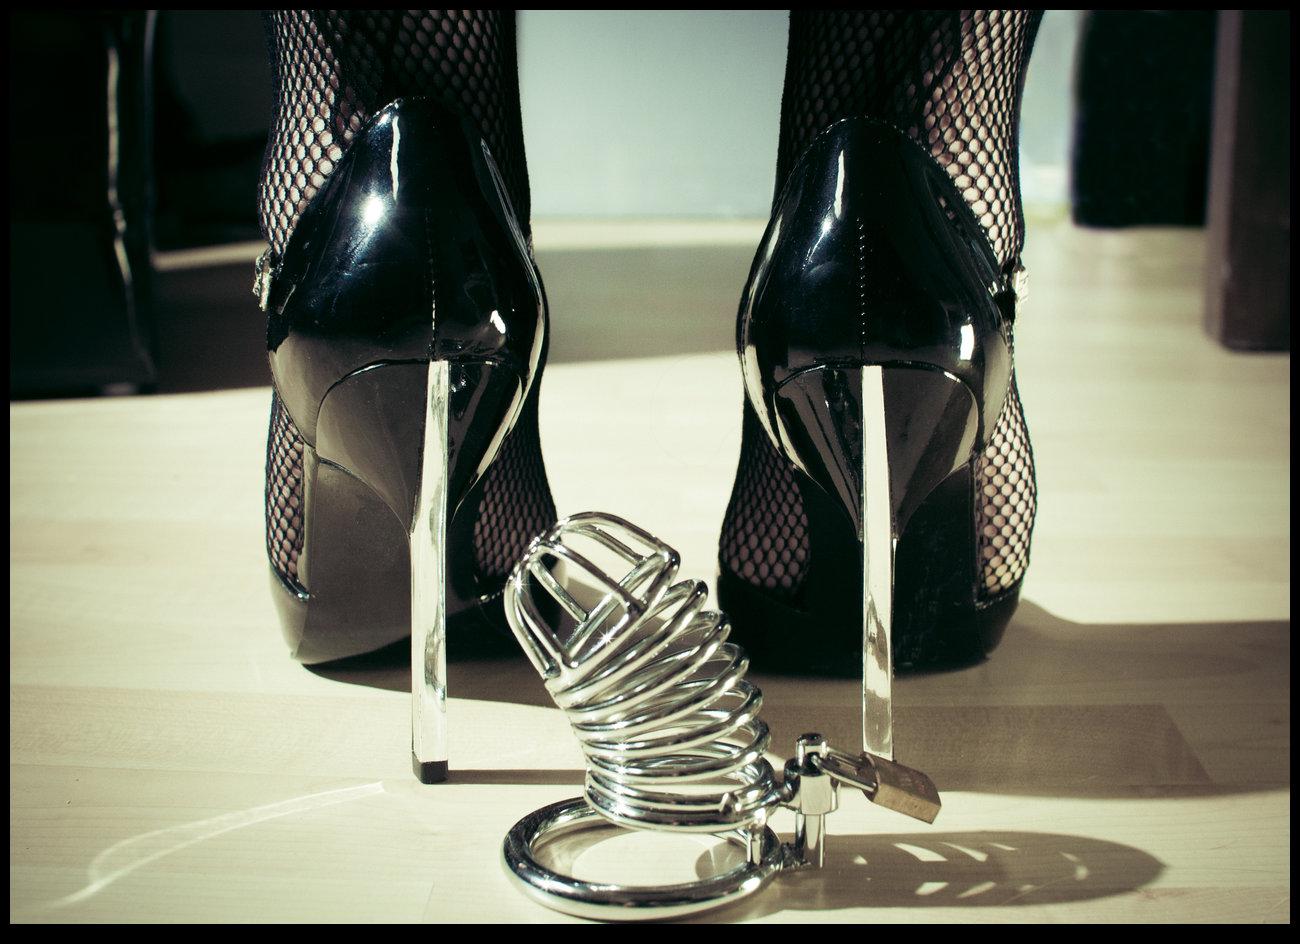 Mistress Ana